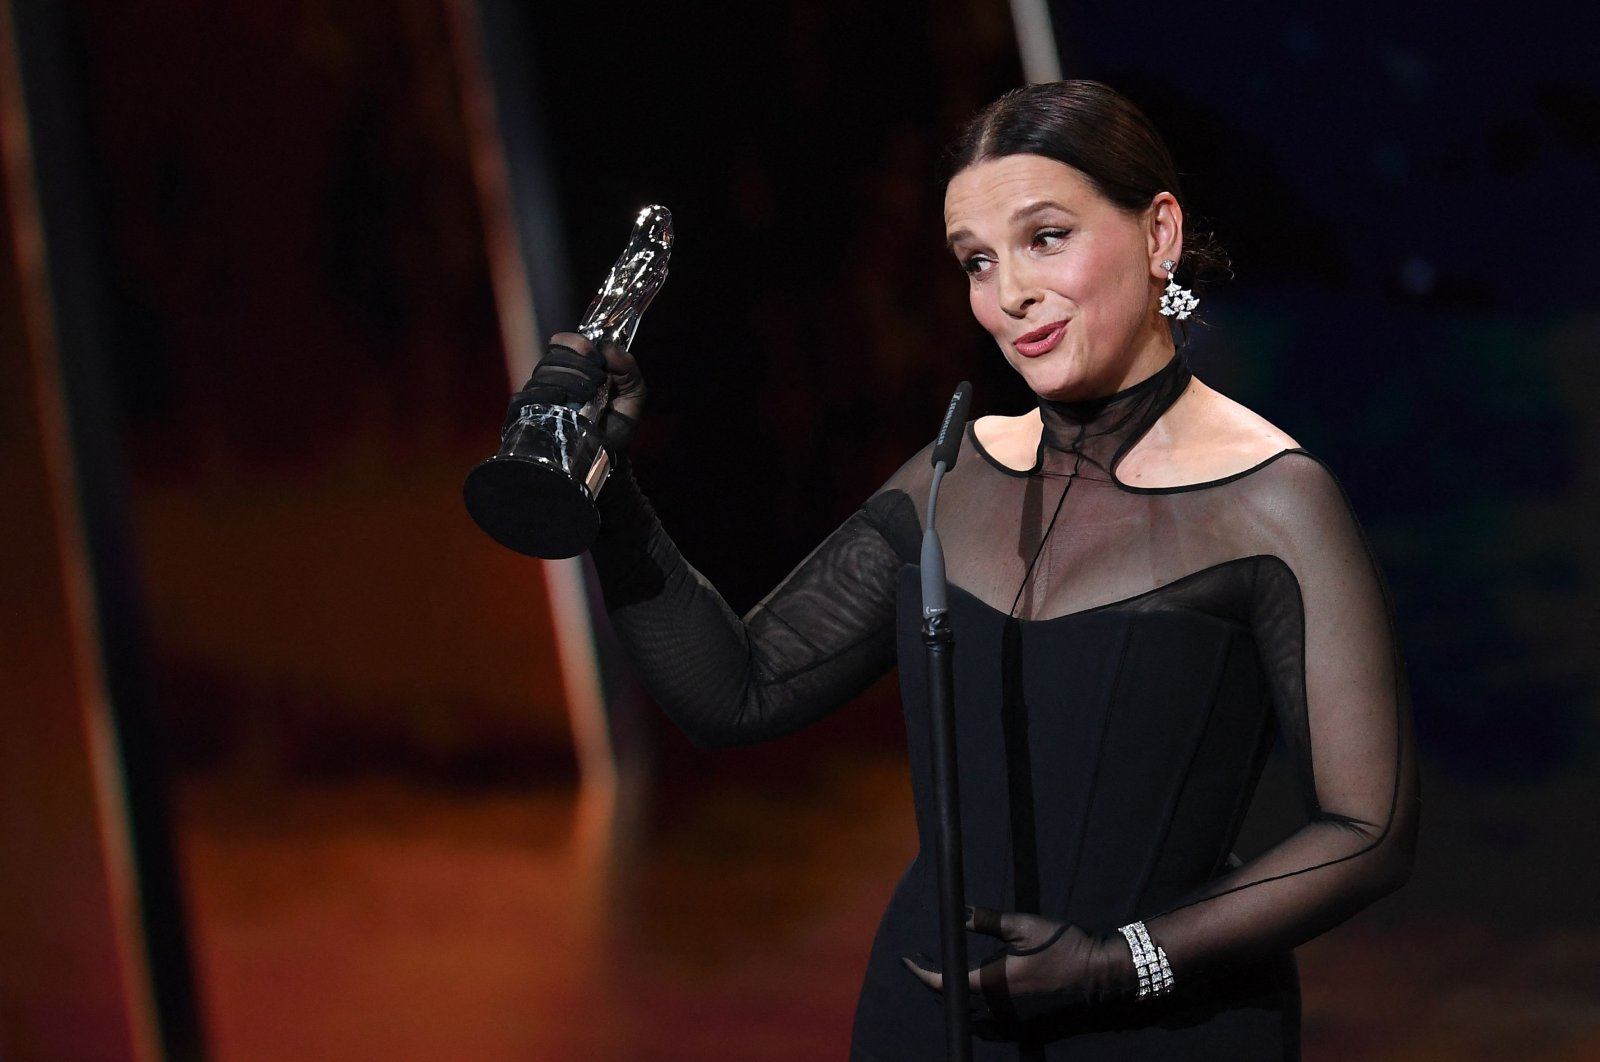 Oscar-winning French actress Juliette Binoche accepts the European Achievement in World Cinema award during the European Film Festival awards ceremony in Berlin, Germany, Dec. 7, 2019. (AFP Photo)